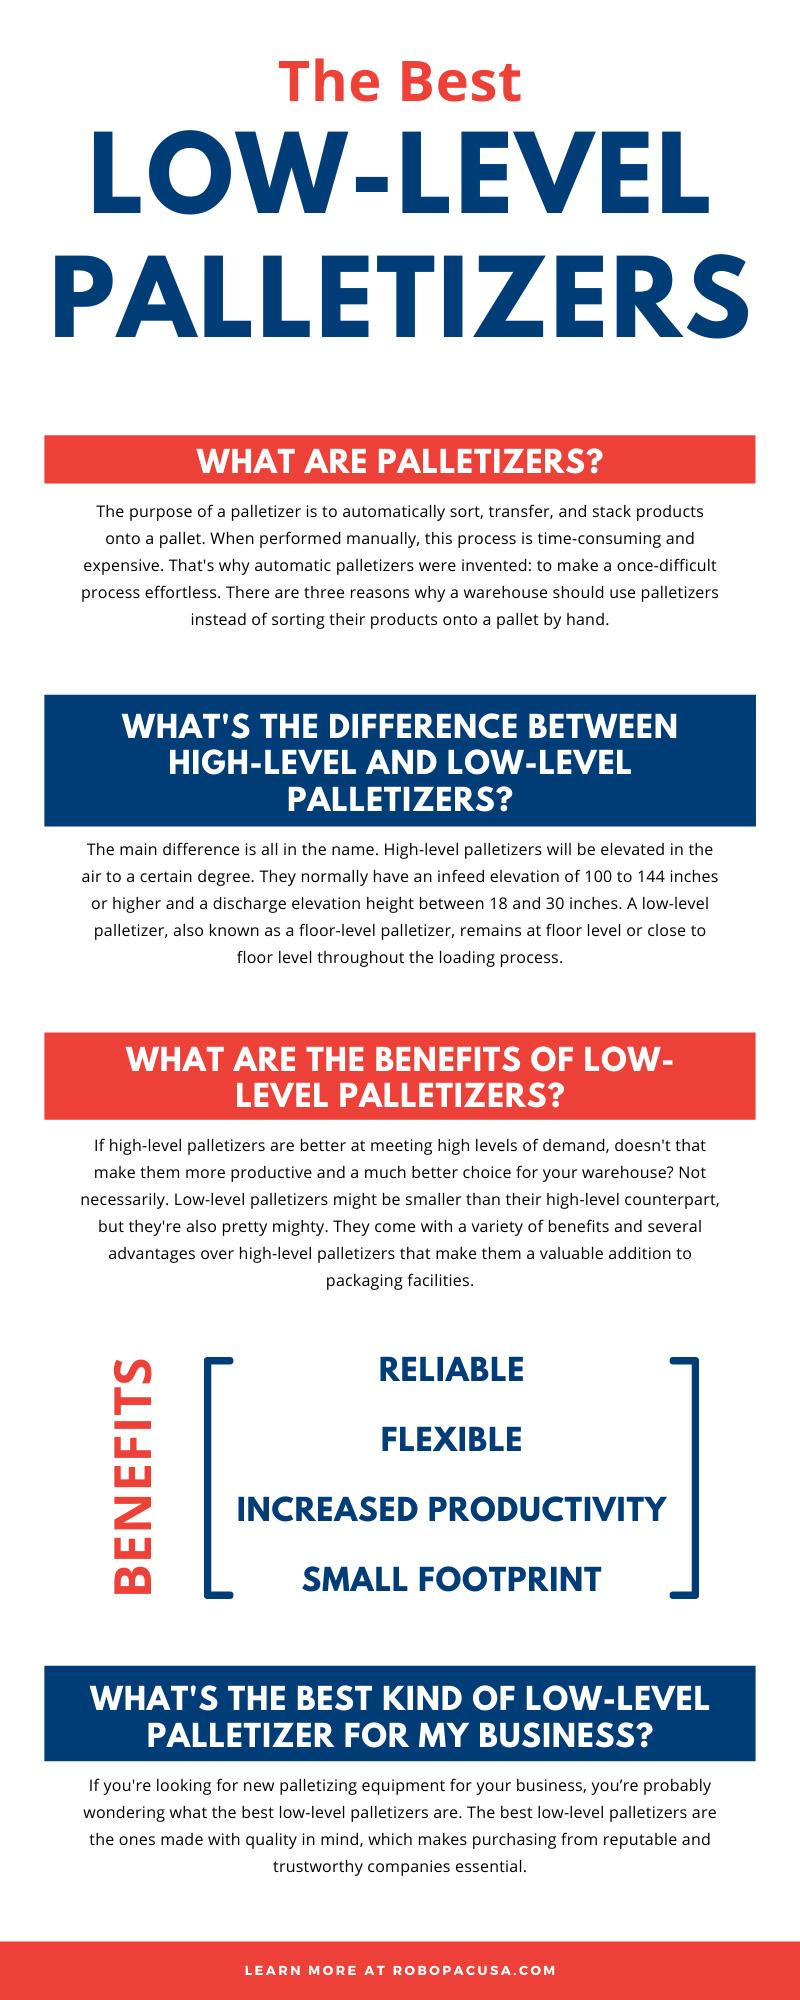 Low-Level Palletizers